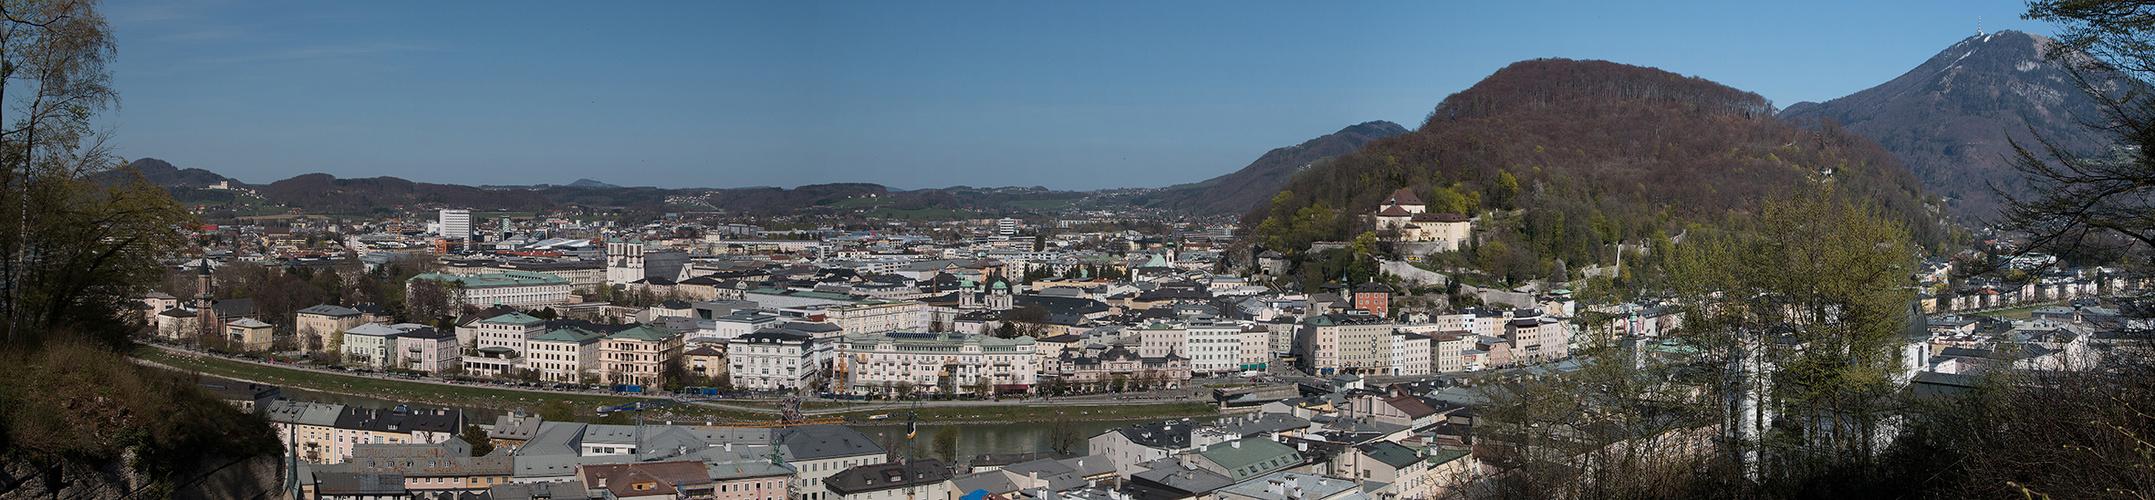 Salzburgpanorama vom Mönchsberg aus